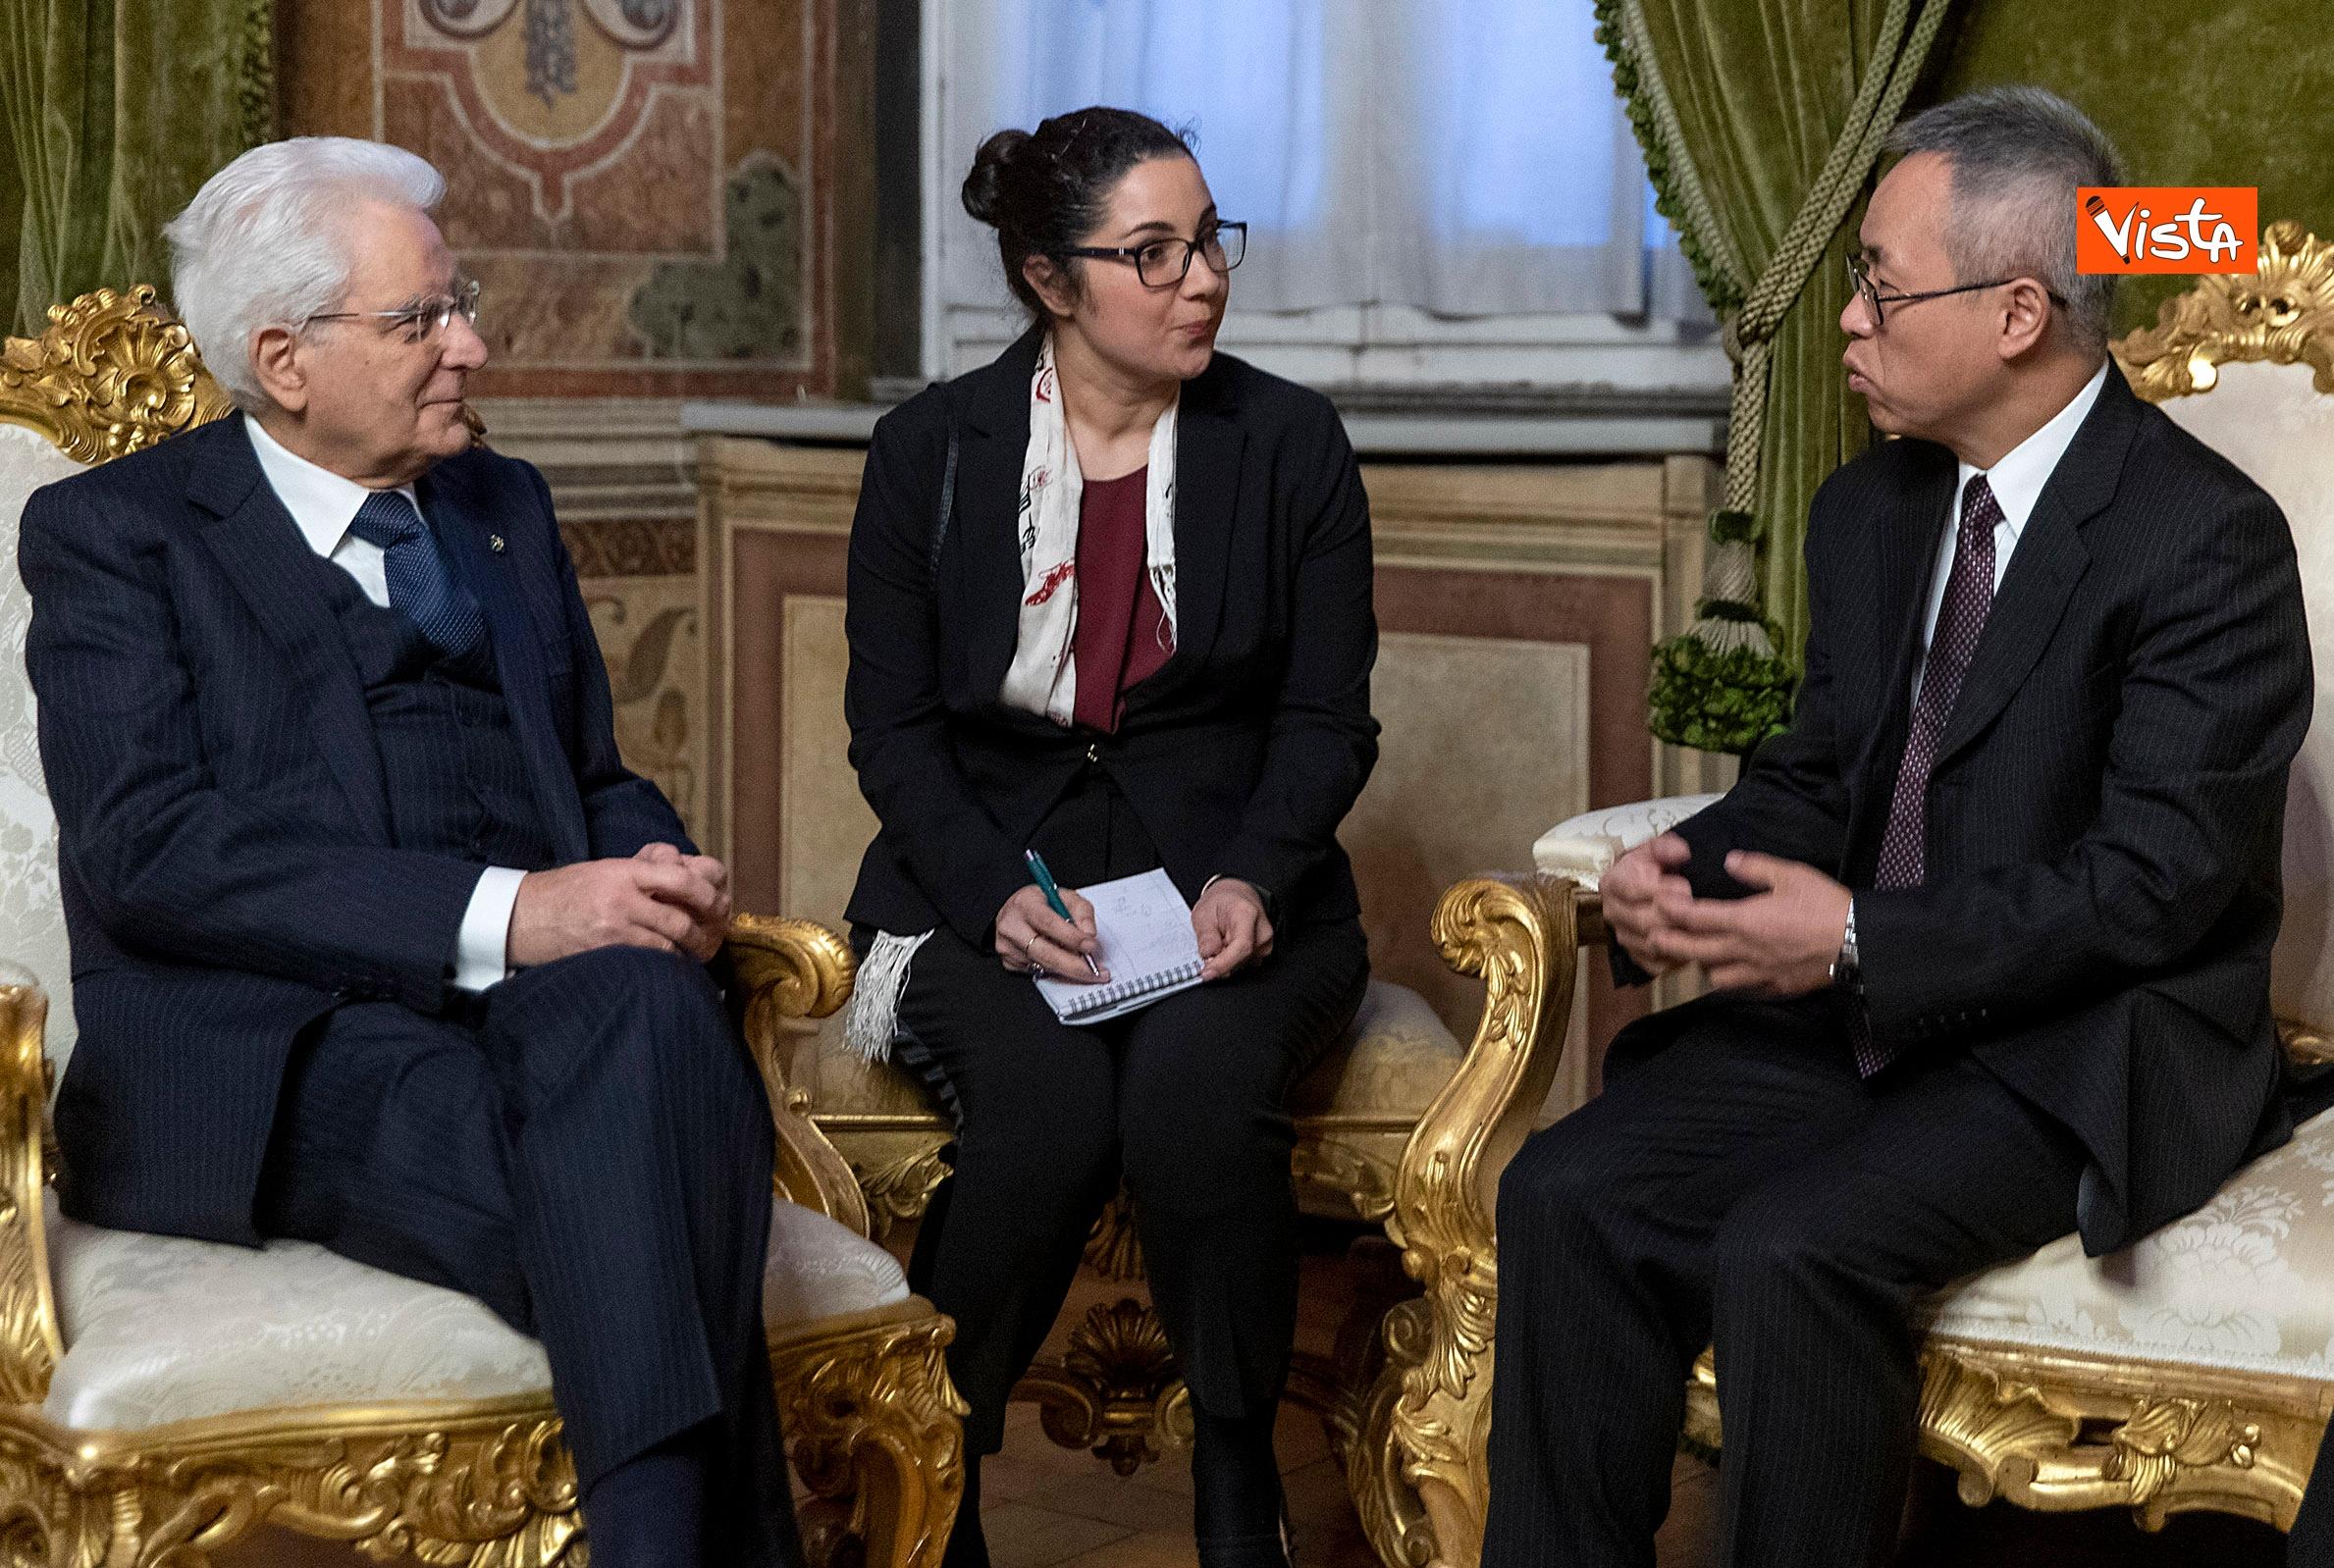 13-02-20 Italia Cina Mattarella incontra ambasciatore cinese in Italia Li Junhua_06